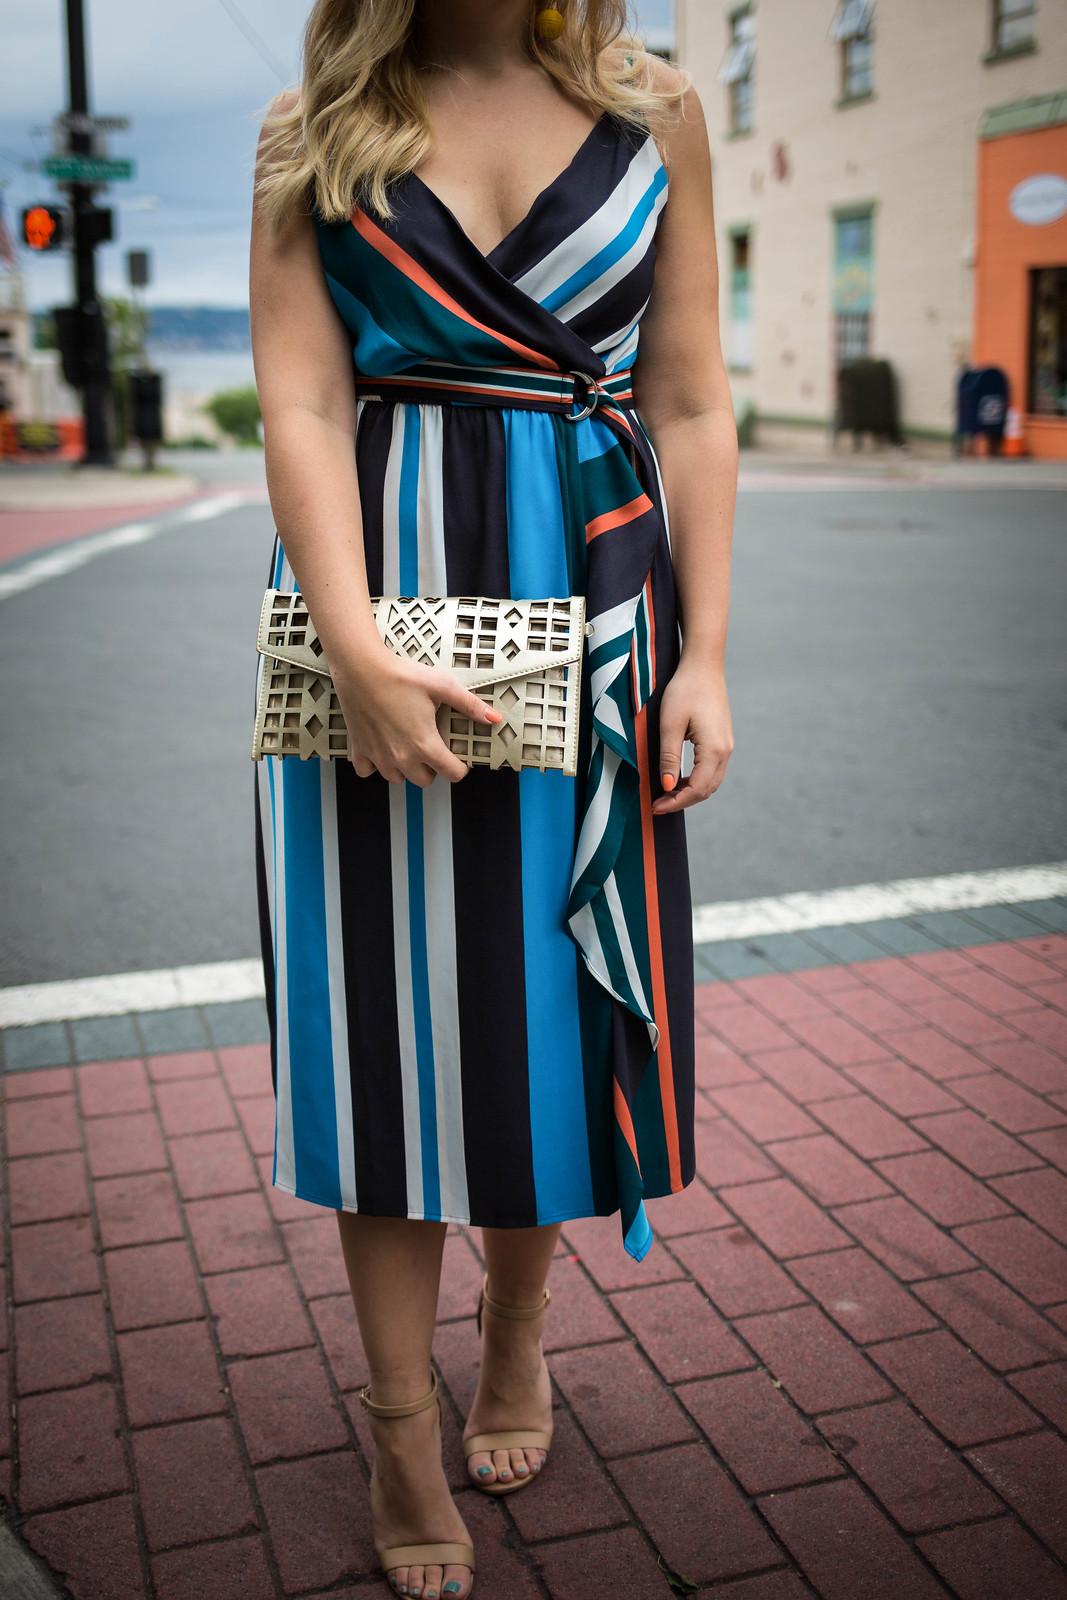 The Best Dresses for a Fall Wedding | Loft Skyline Wrap Dress Jackie Giardina